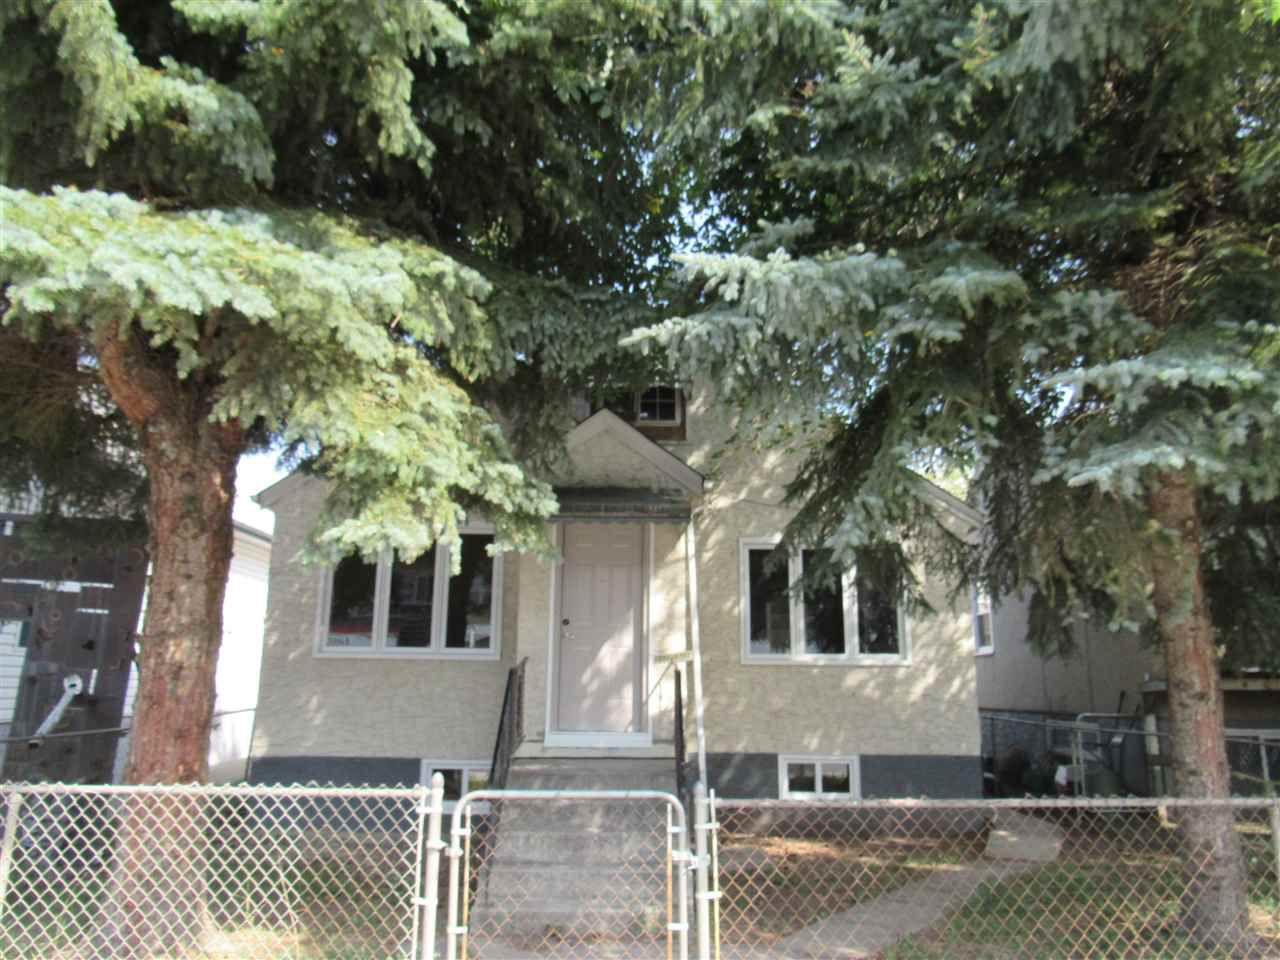 Main Photo: 10907 97 Street in Edmonton: Zone 13 House for sale : MLS®# E4143932